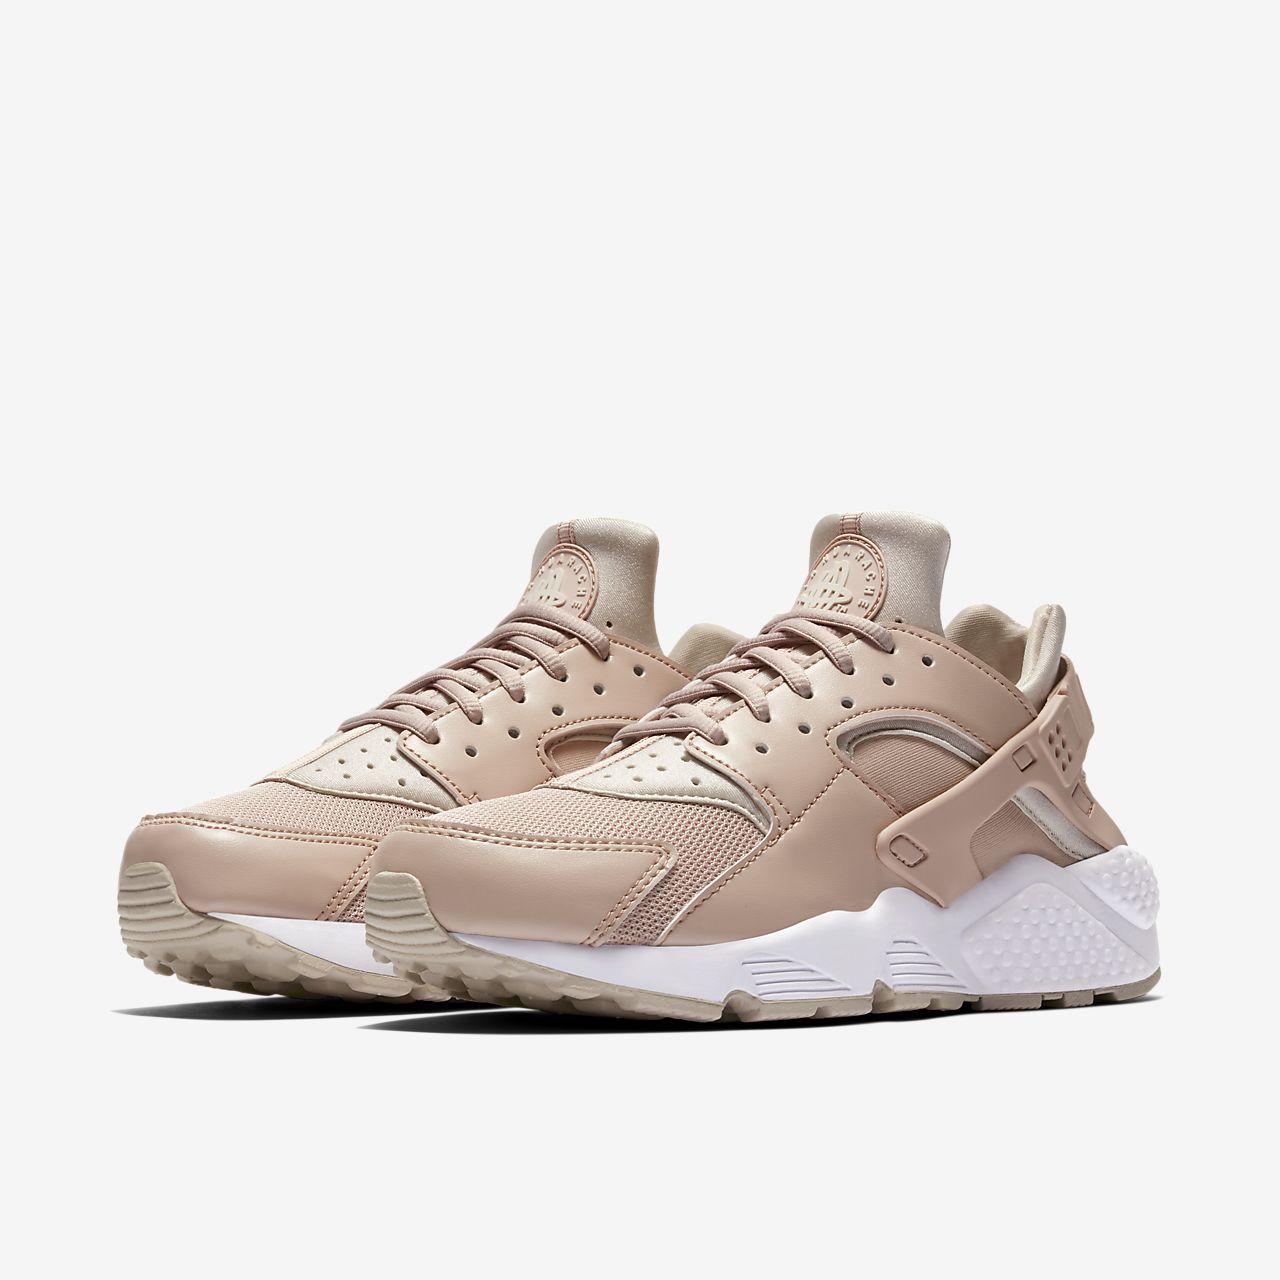 info for f6e29 80da9 ... Nike Air Huarache Womens Shoe